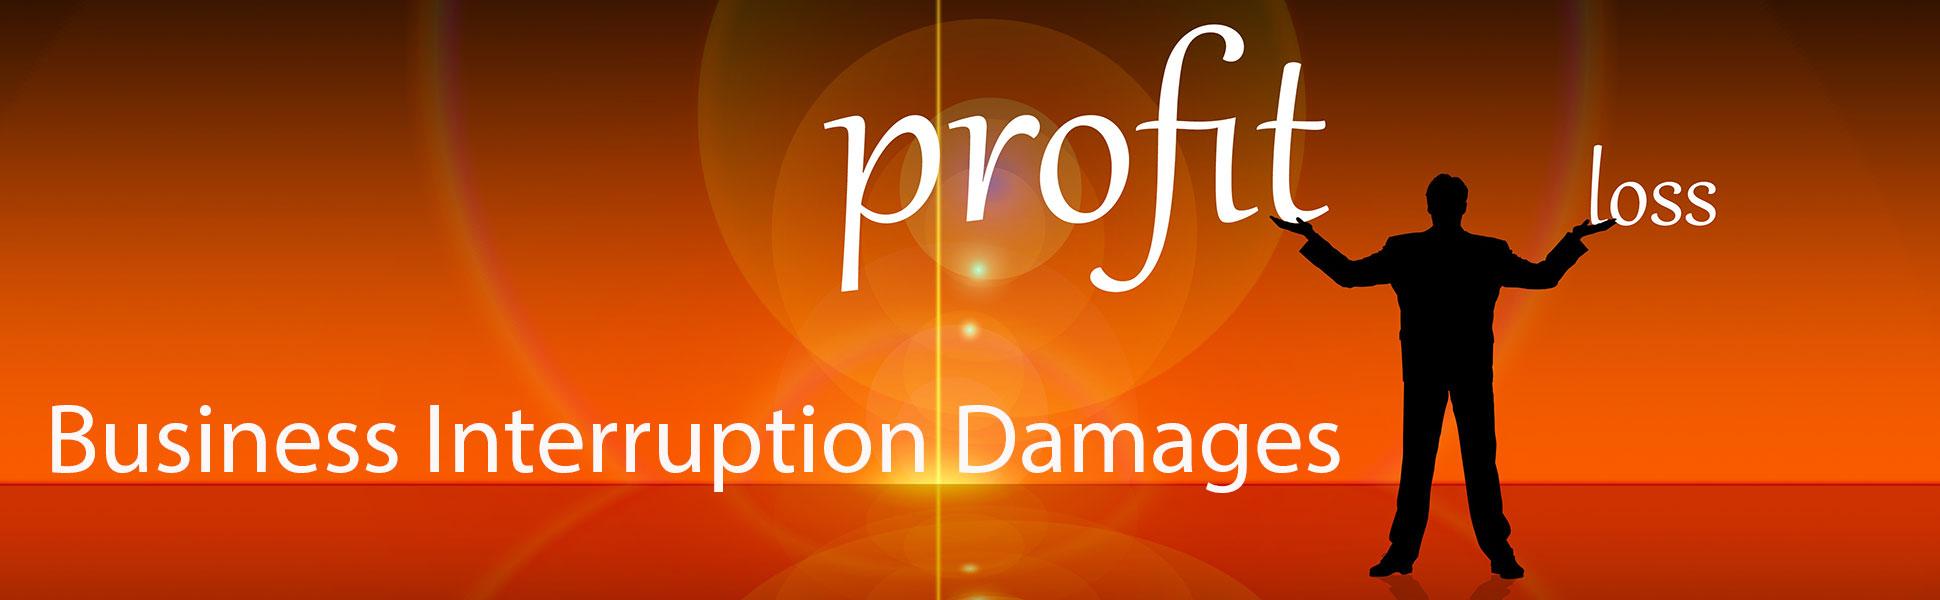 APLC-Business-Interruption-Insurance Claims-Wehandleinsuranceclaims.com